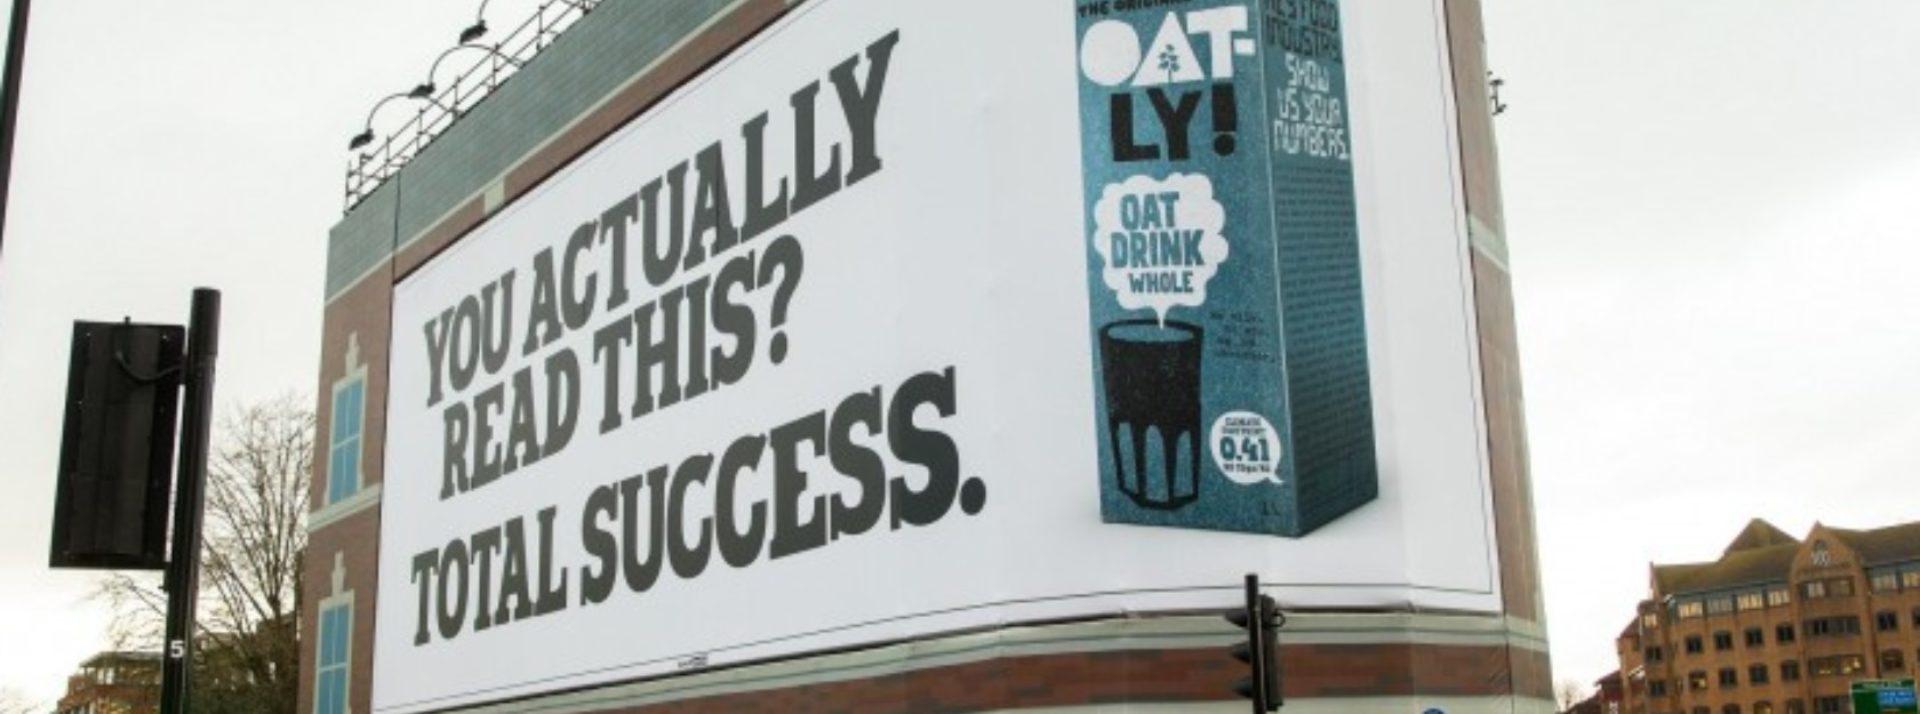 Oatly Billboard Campaign